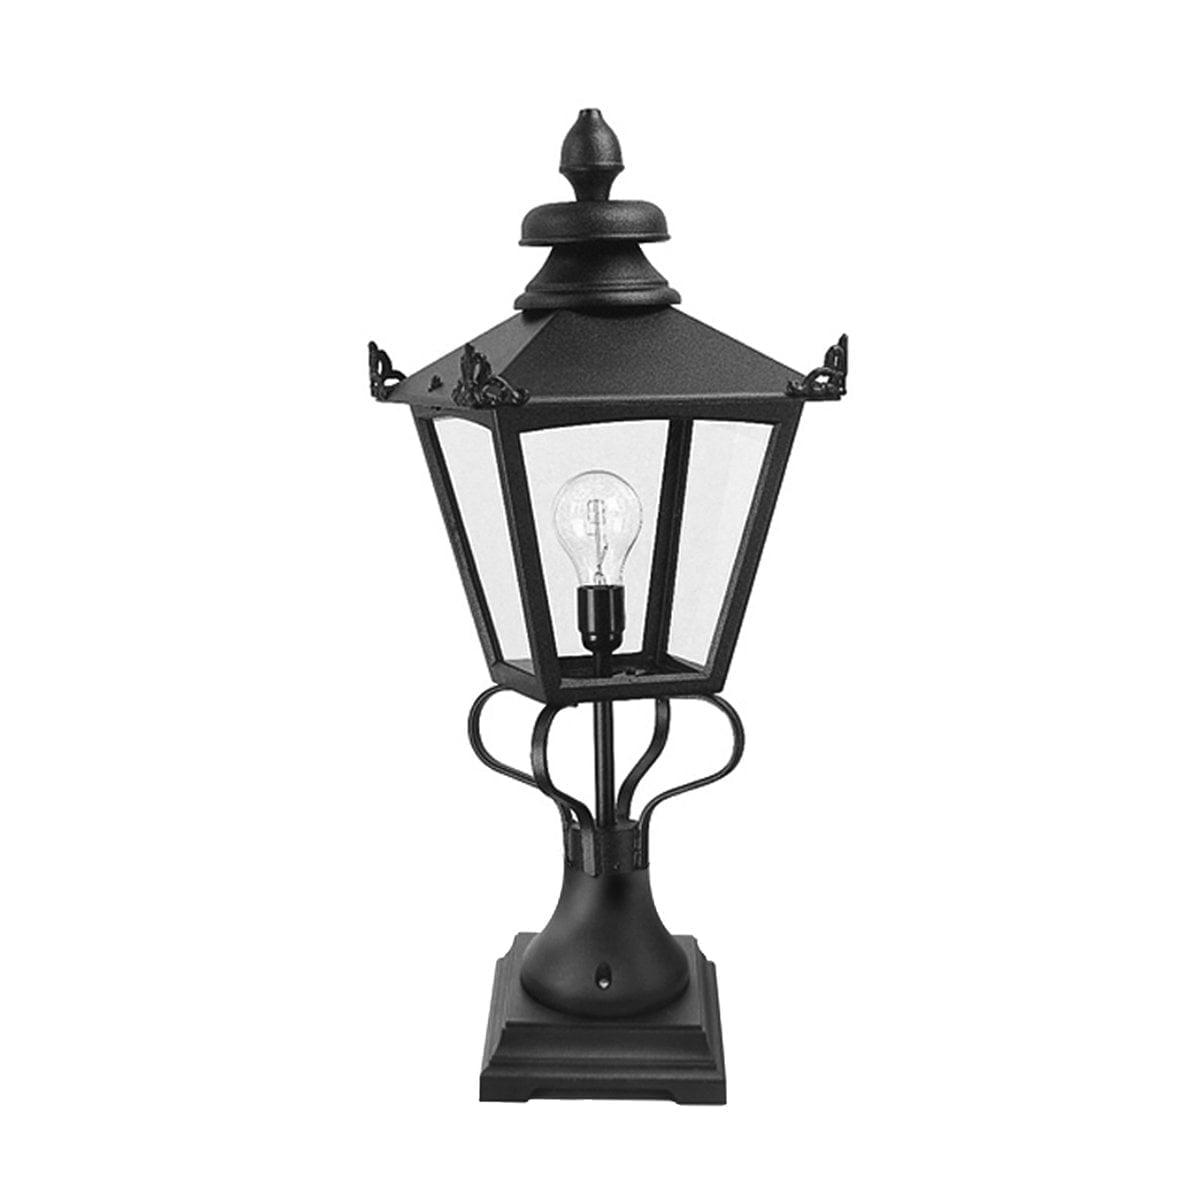 Elstead GN1BLACK Grampian Pedestal Lantern Black